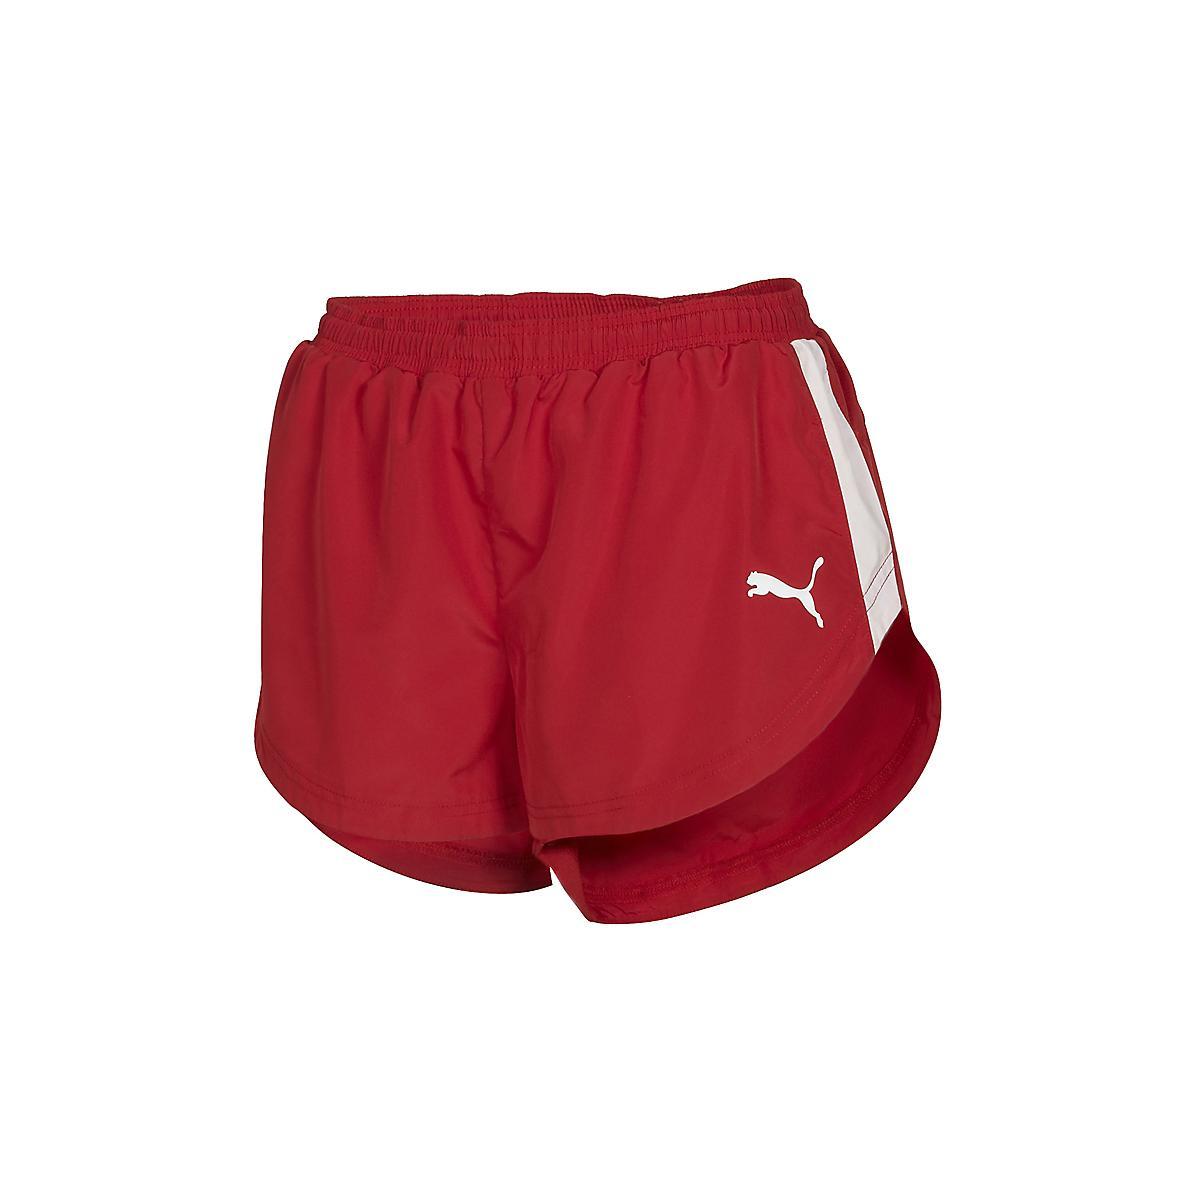 a8e585e627ad Mens Puma TB Running Splits Shorts at Road Runner Sports